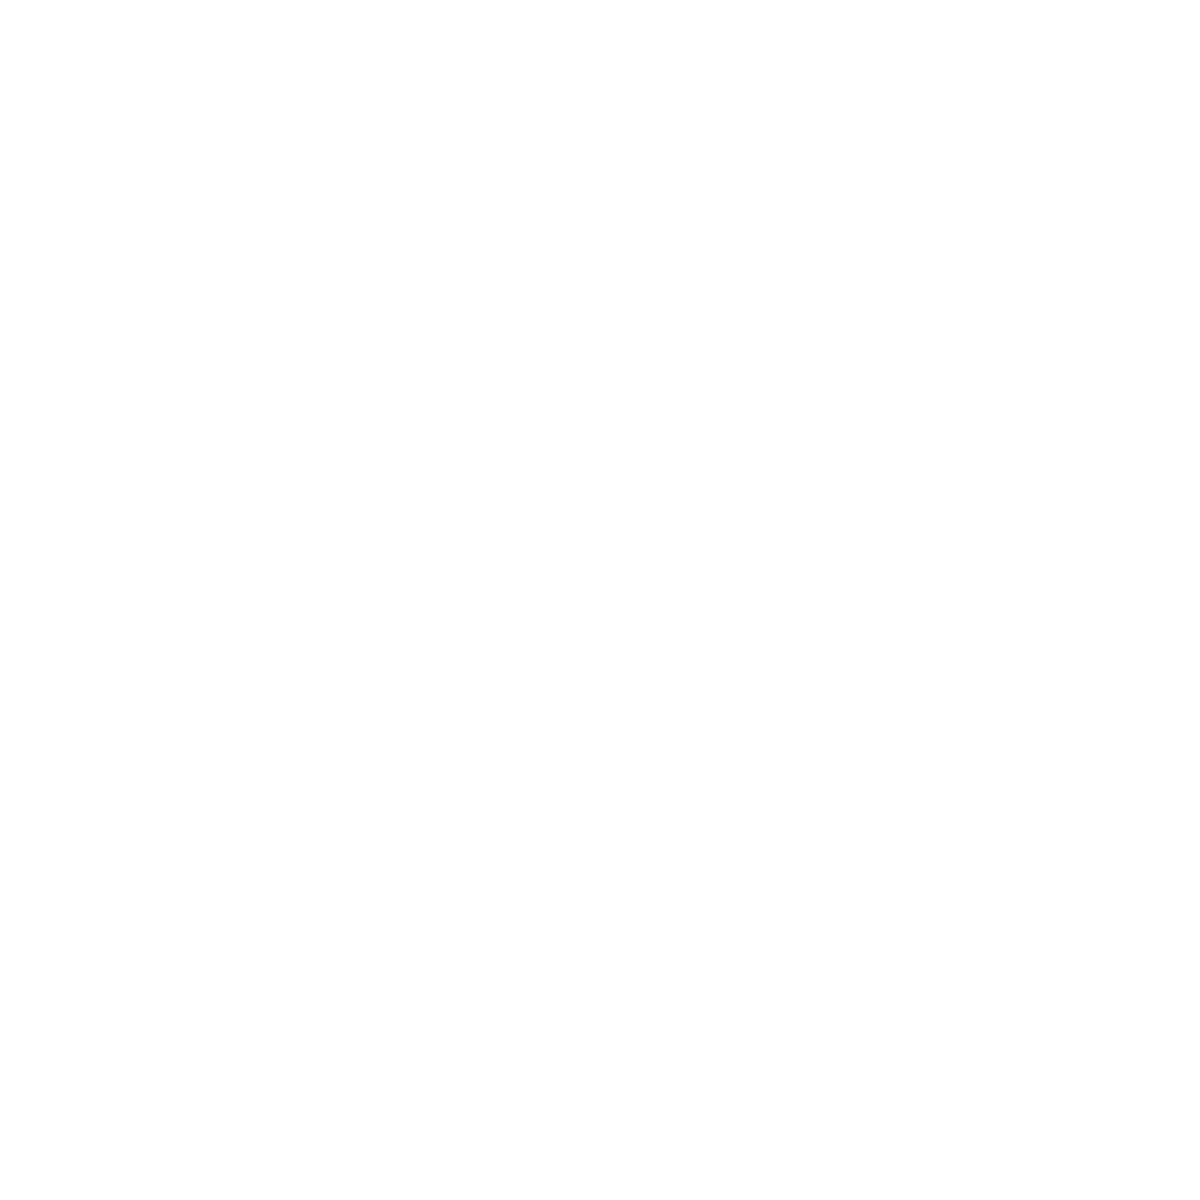 noun_Handshake_602639_FFFFFF